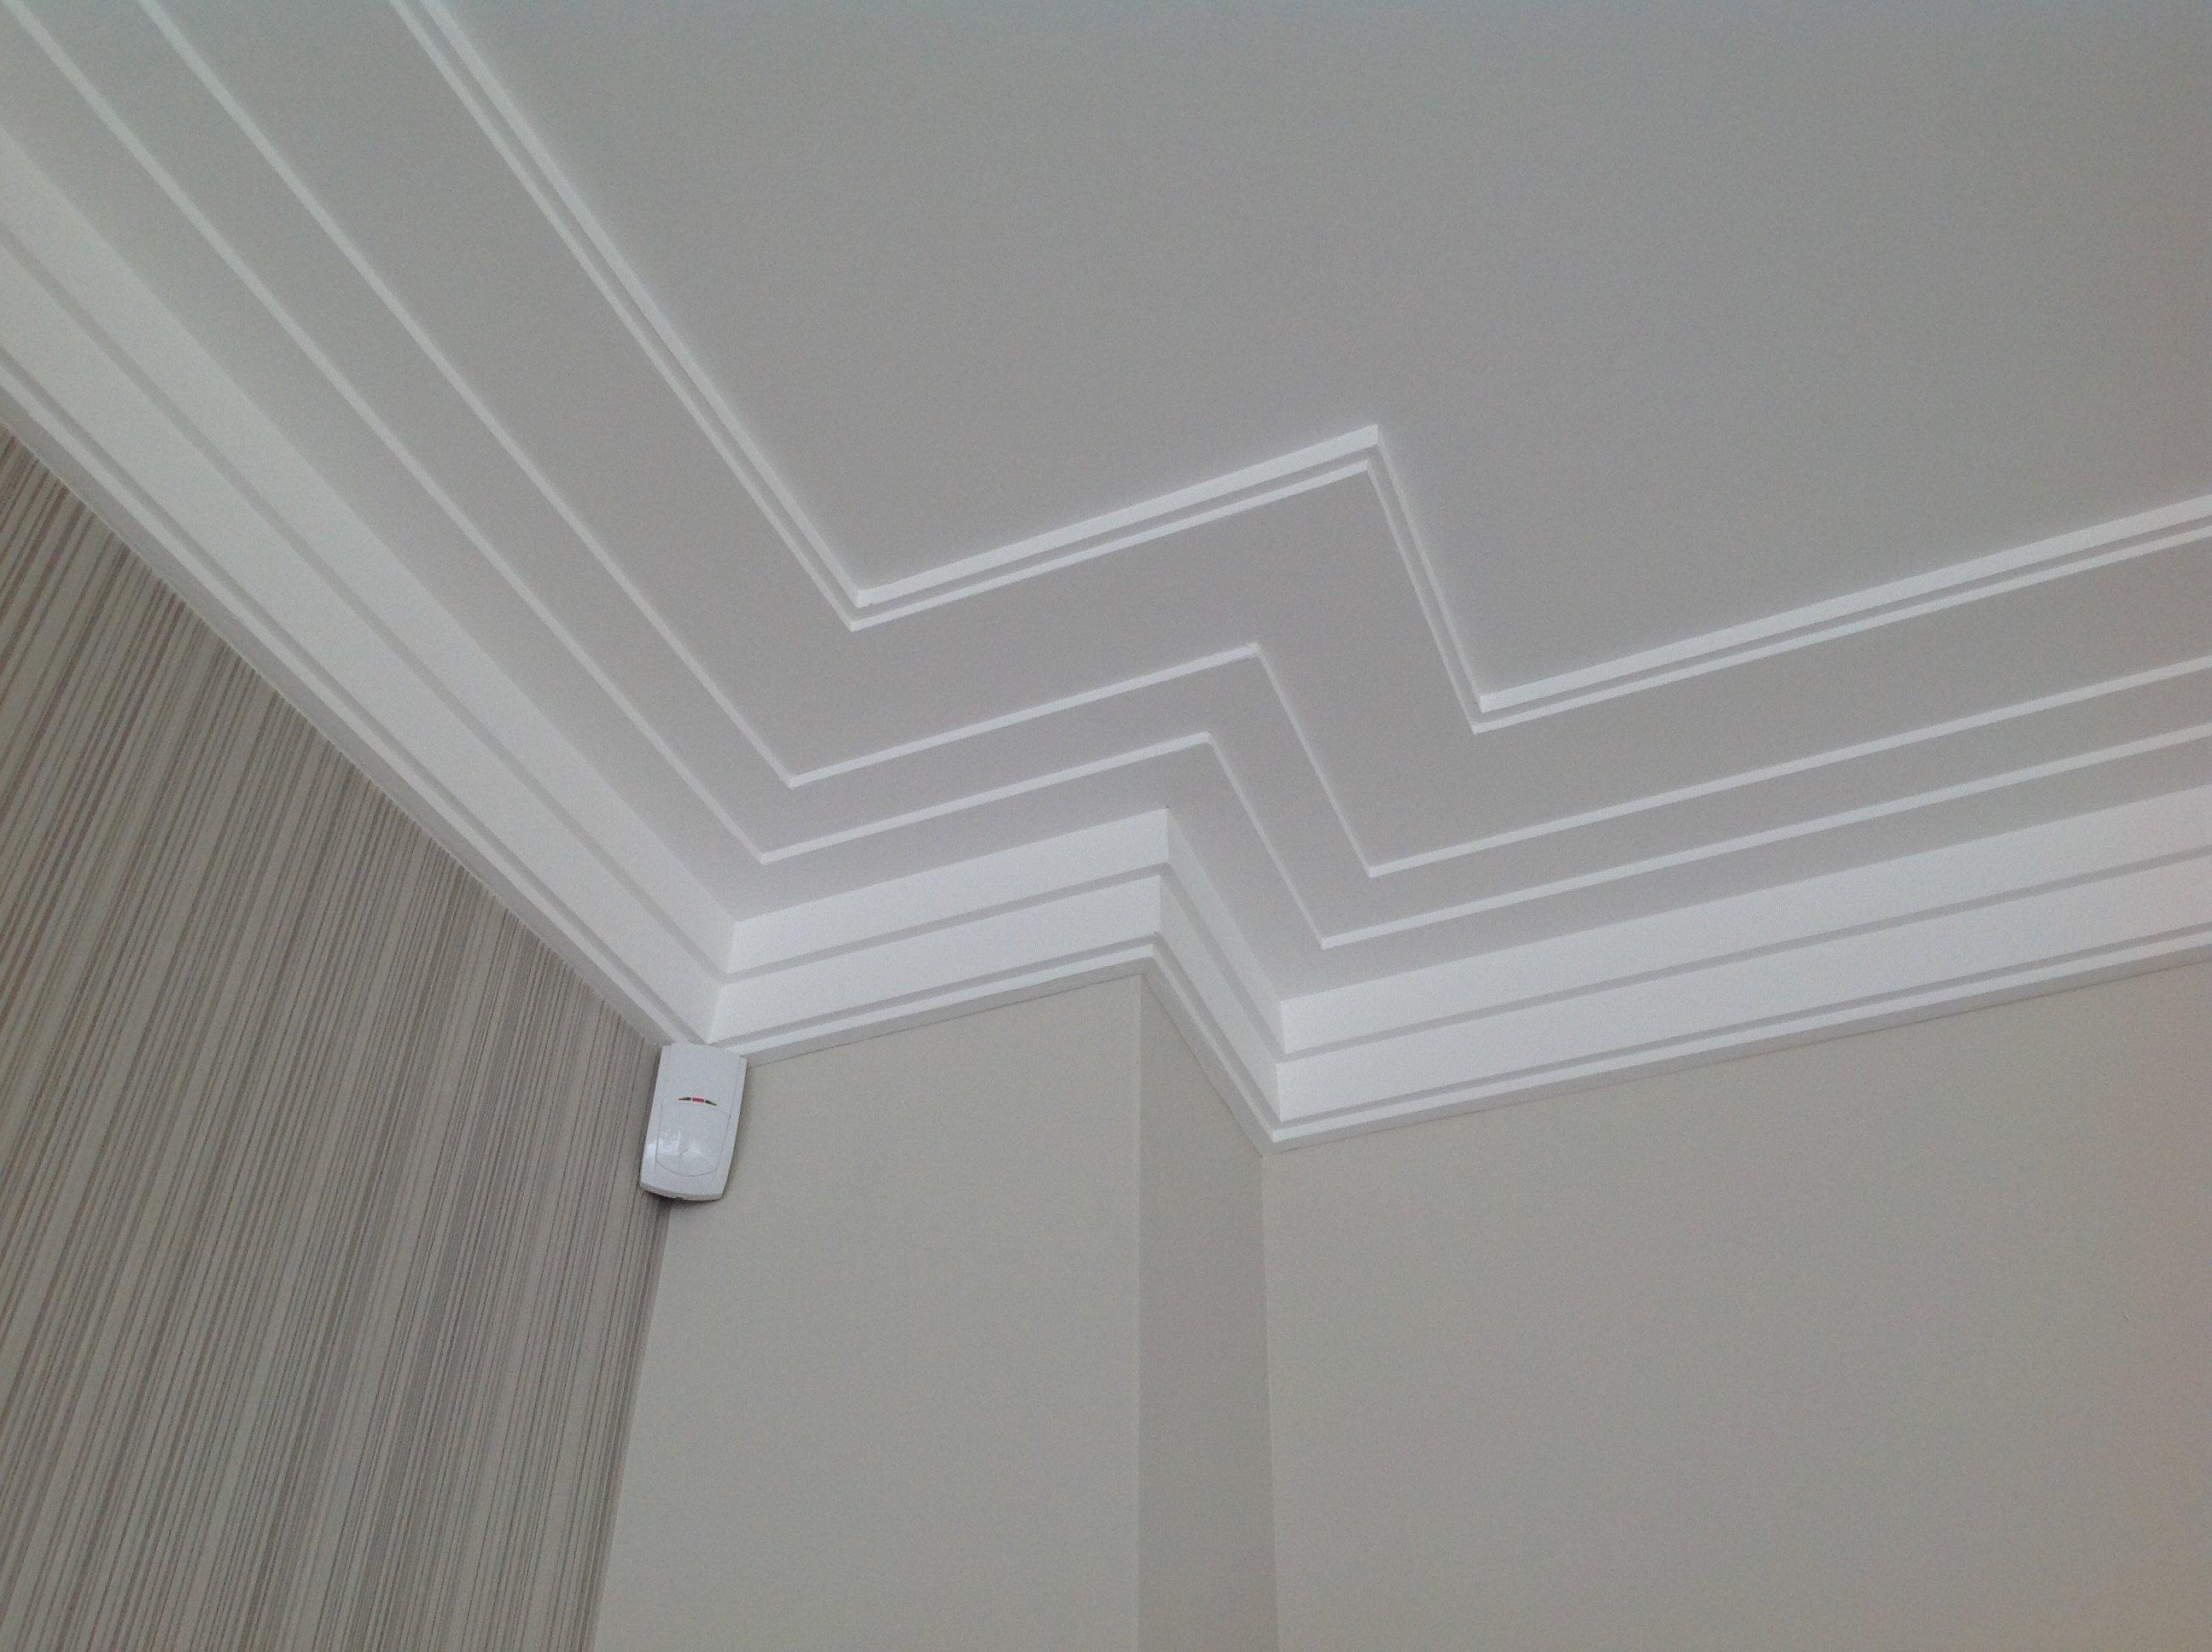 corner of a ceiling